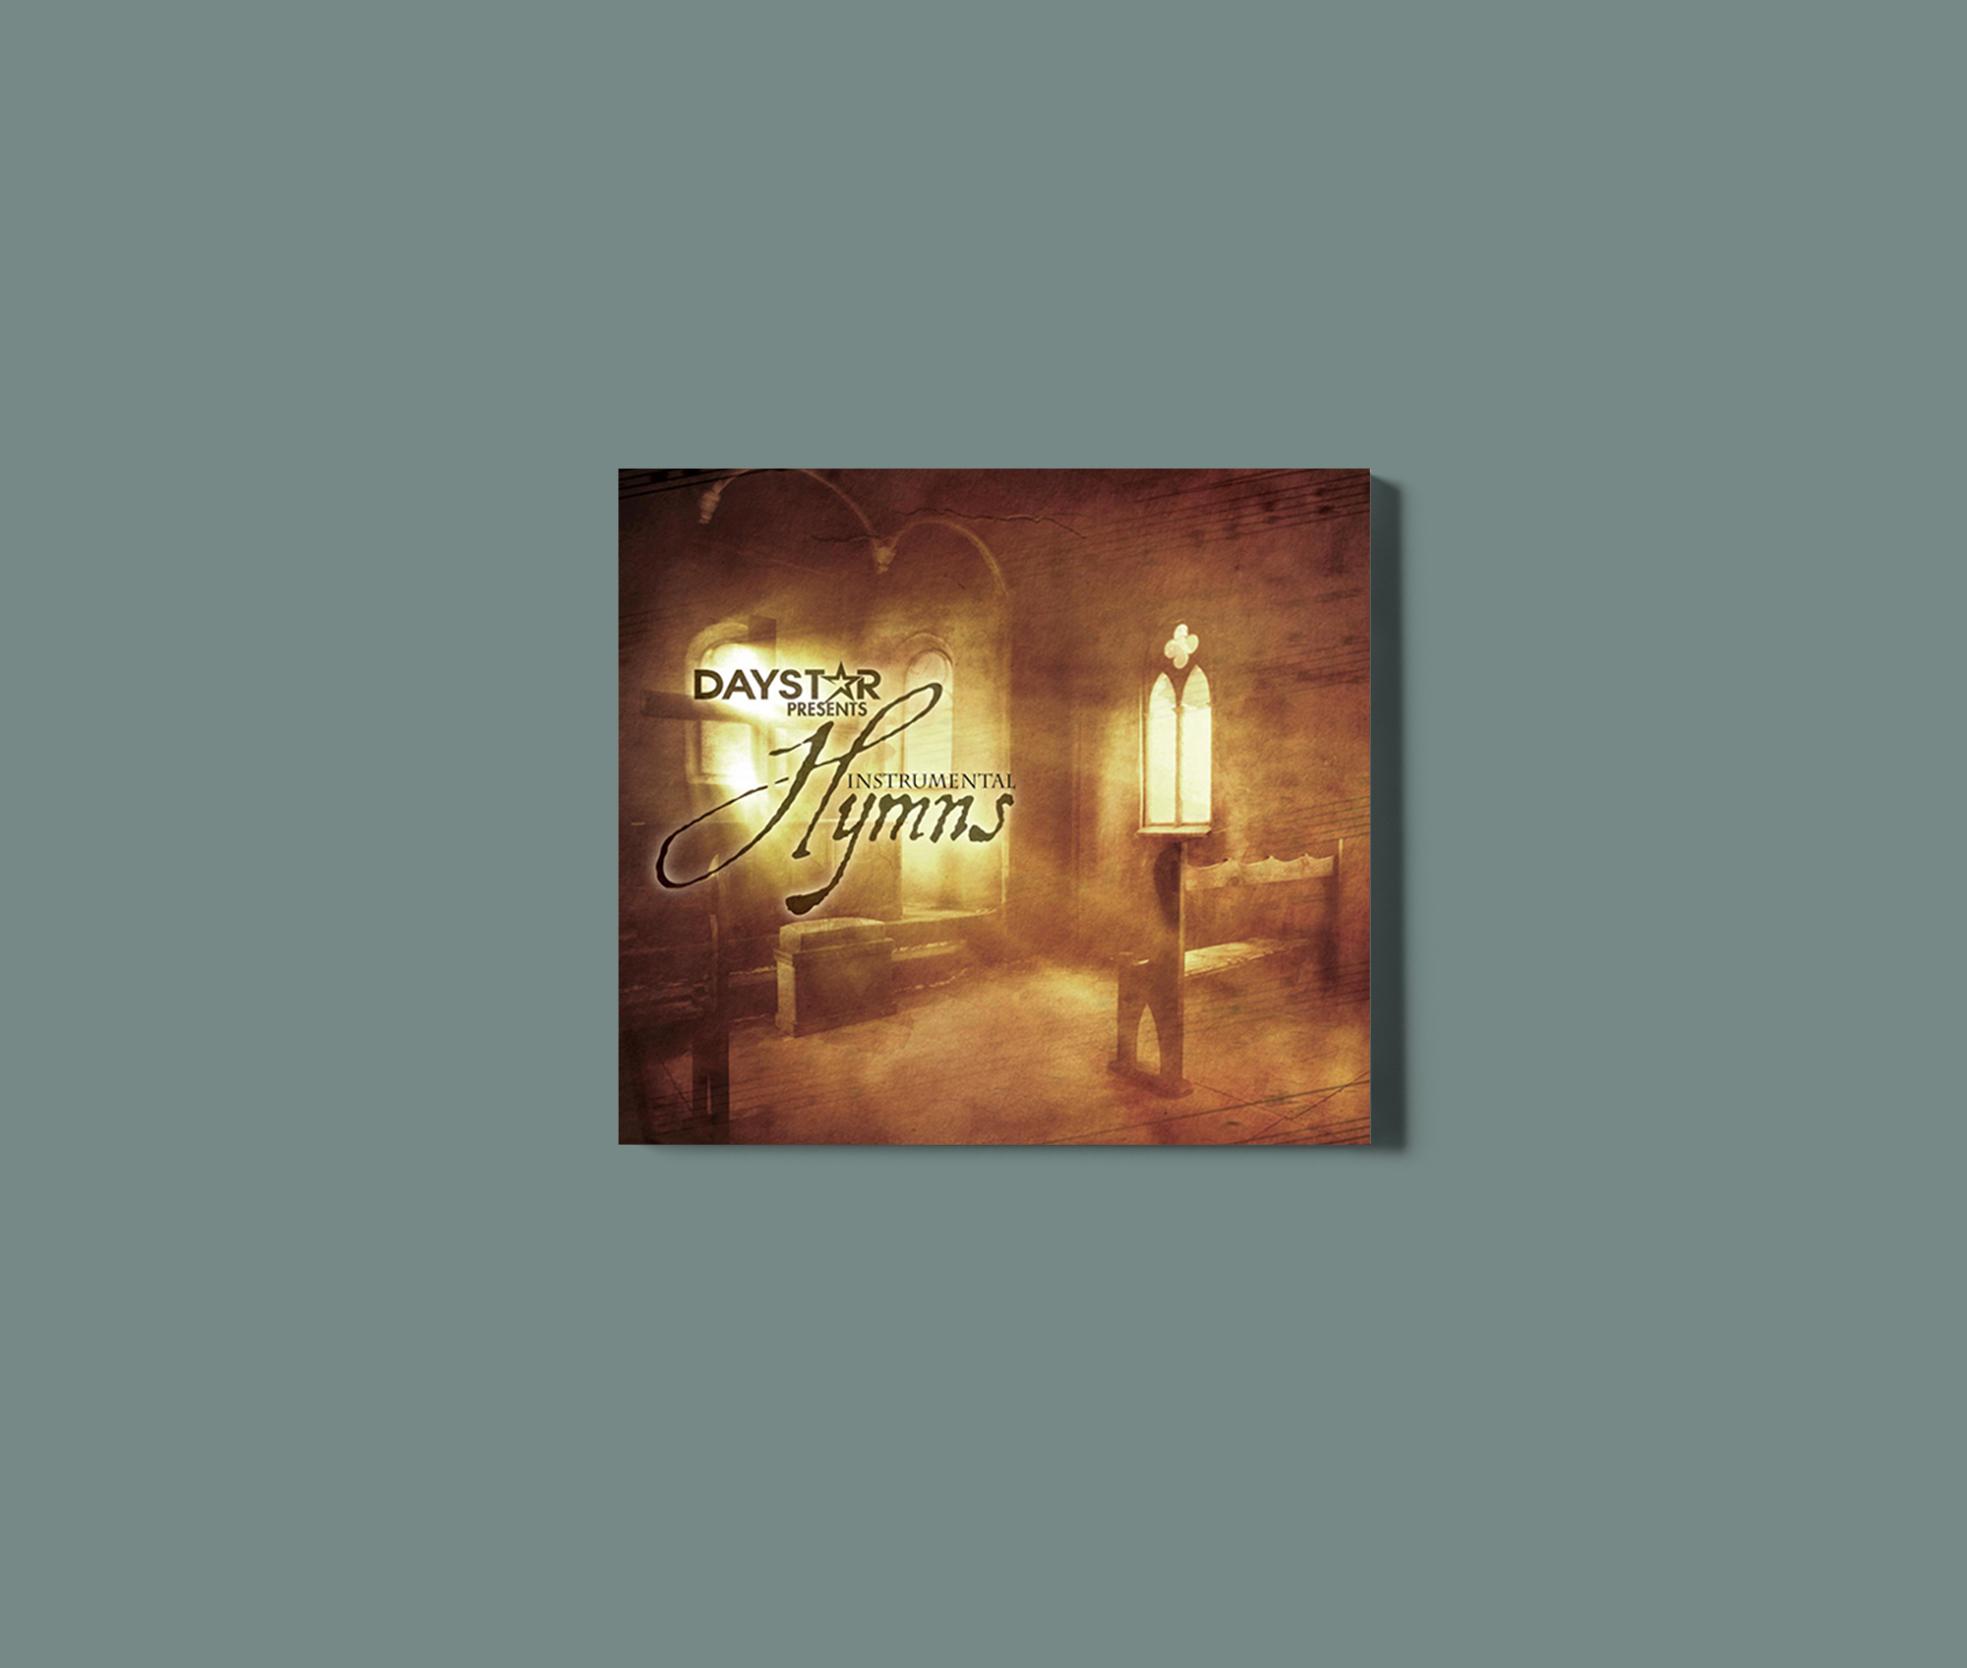 Daystar-Singers-Instrumental